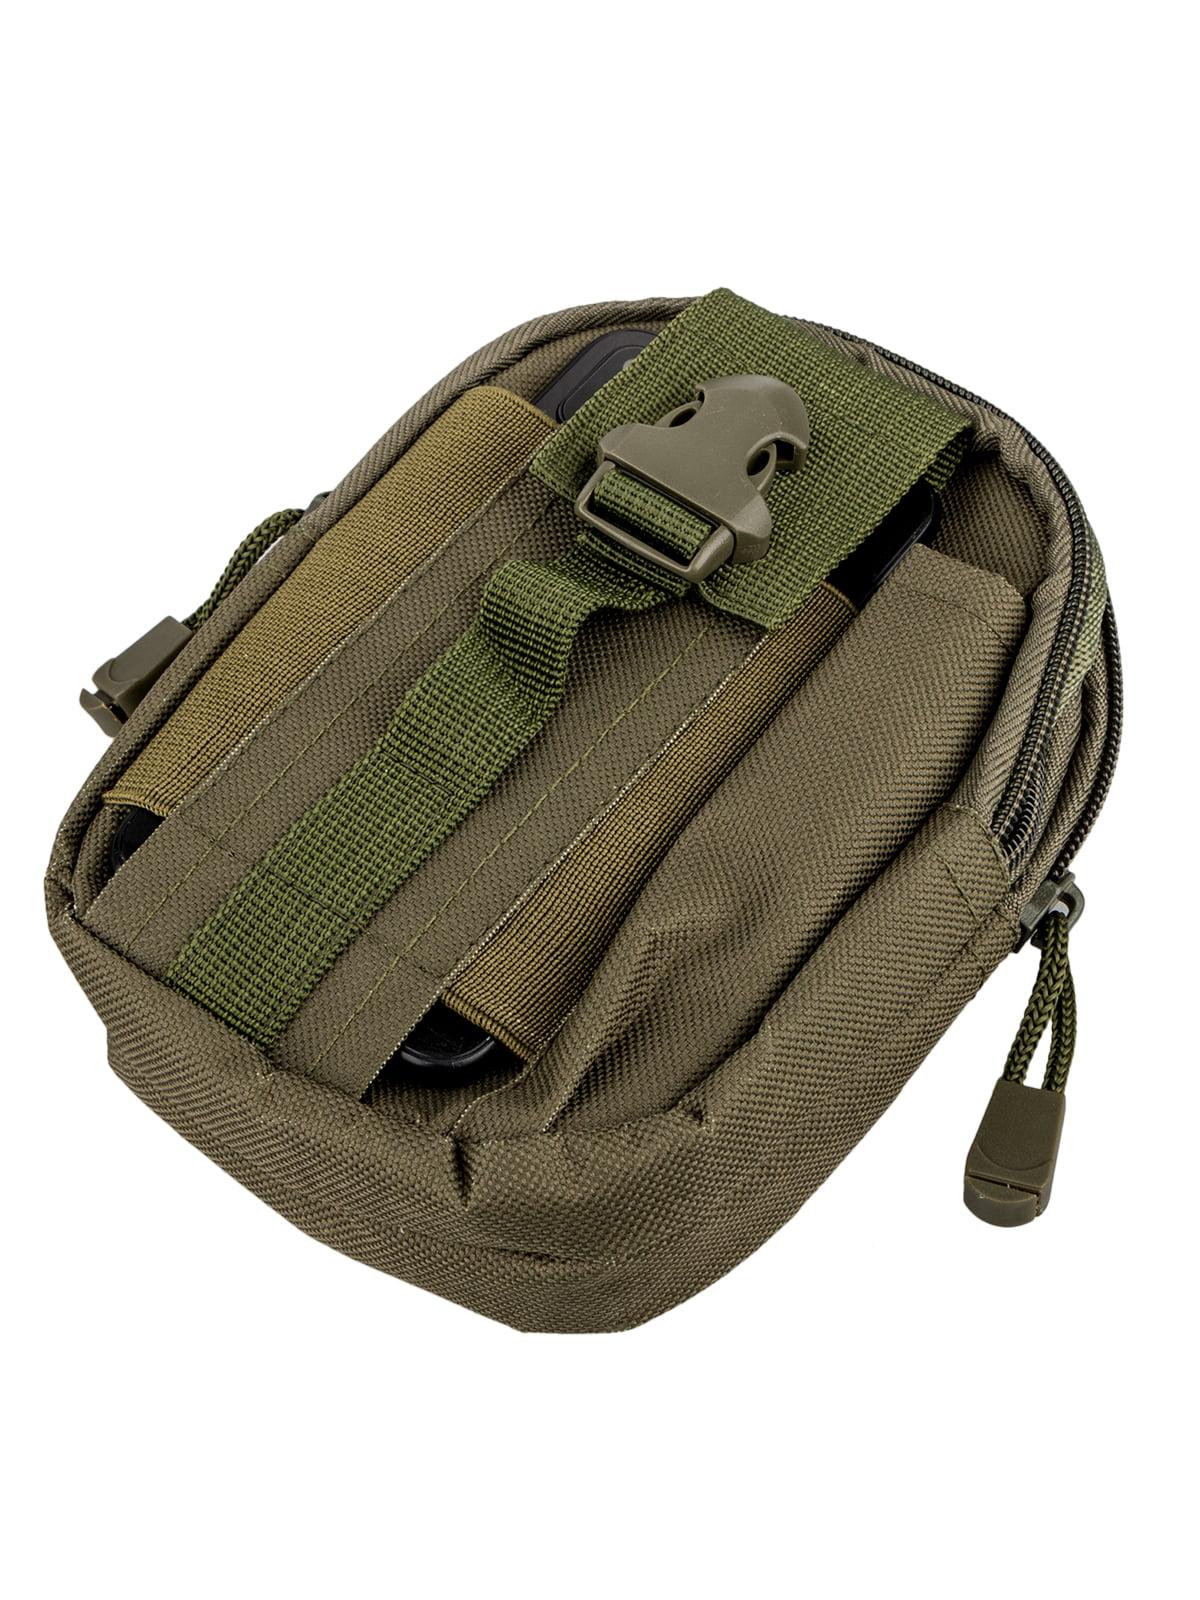 TSV Tactical Molle Pouch EDC Belt Waist Fanny Military Waist Bags Pack Bag Pocket